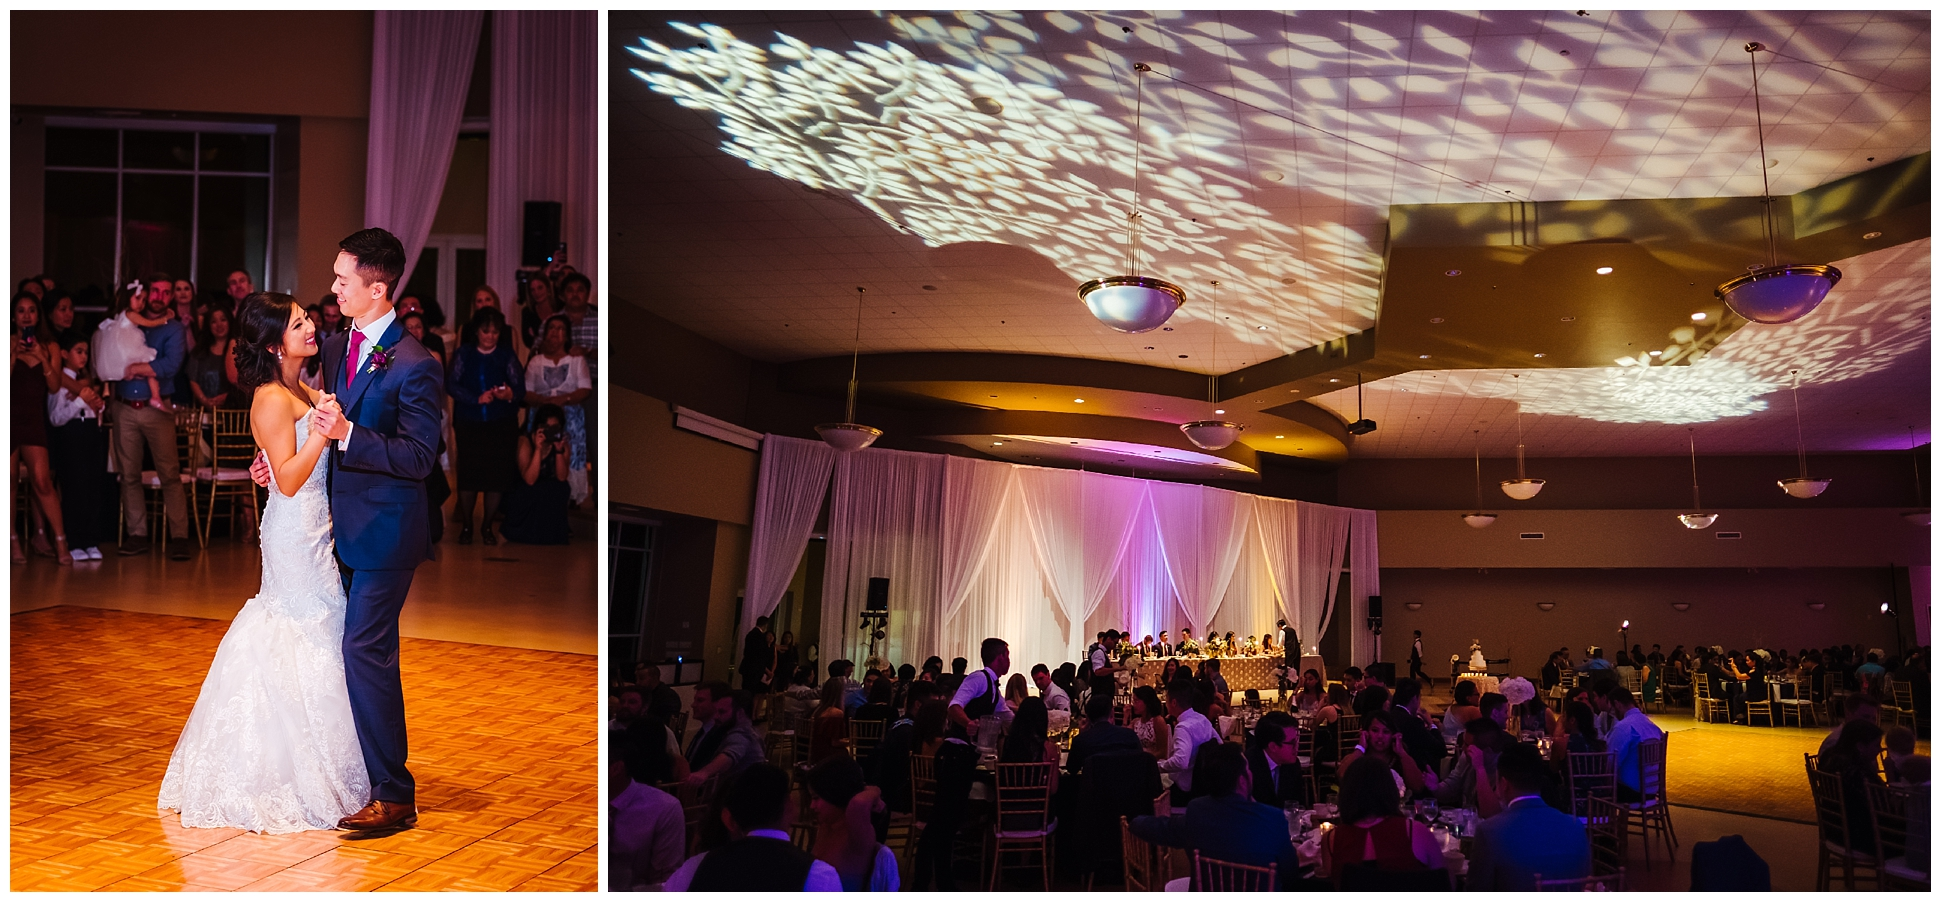 tampa-wedding-photographer-philipino-colorful-woods-ballroom-church-mass-confetti-fuscia_0068.jpg